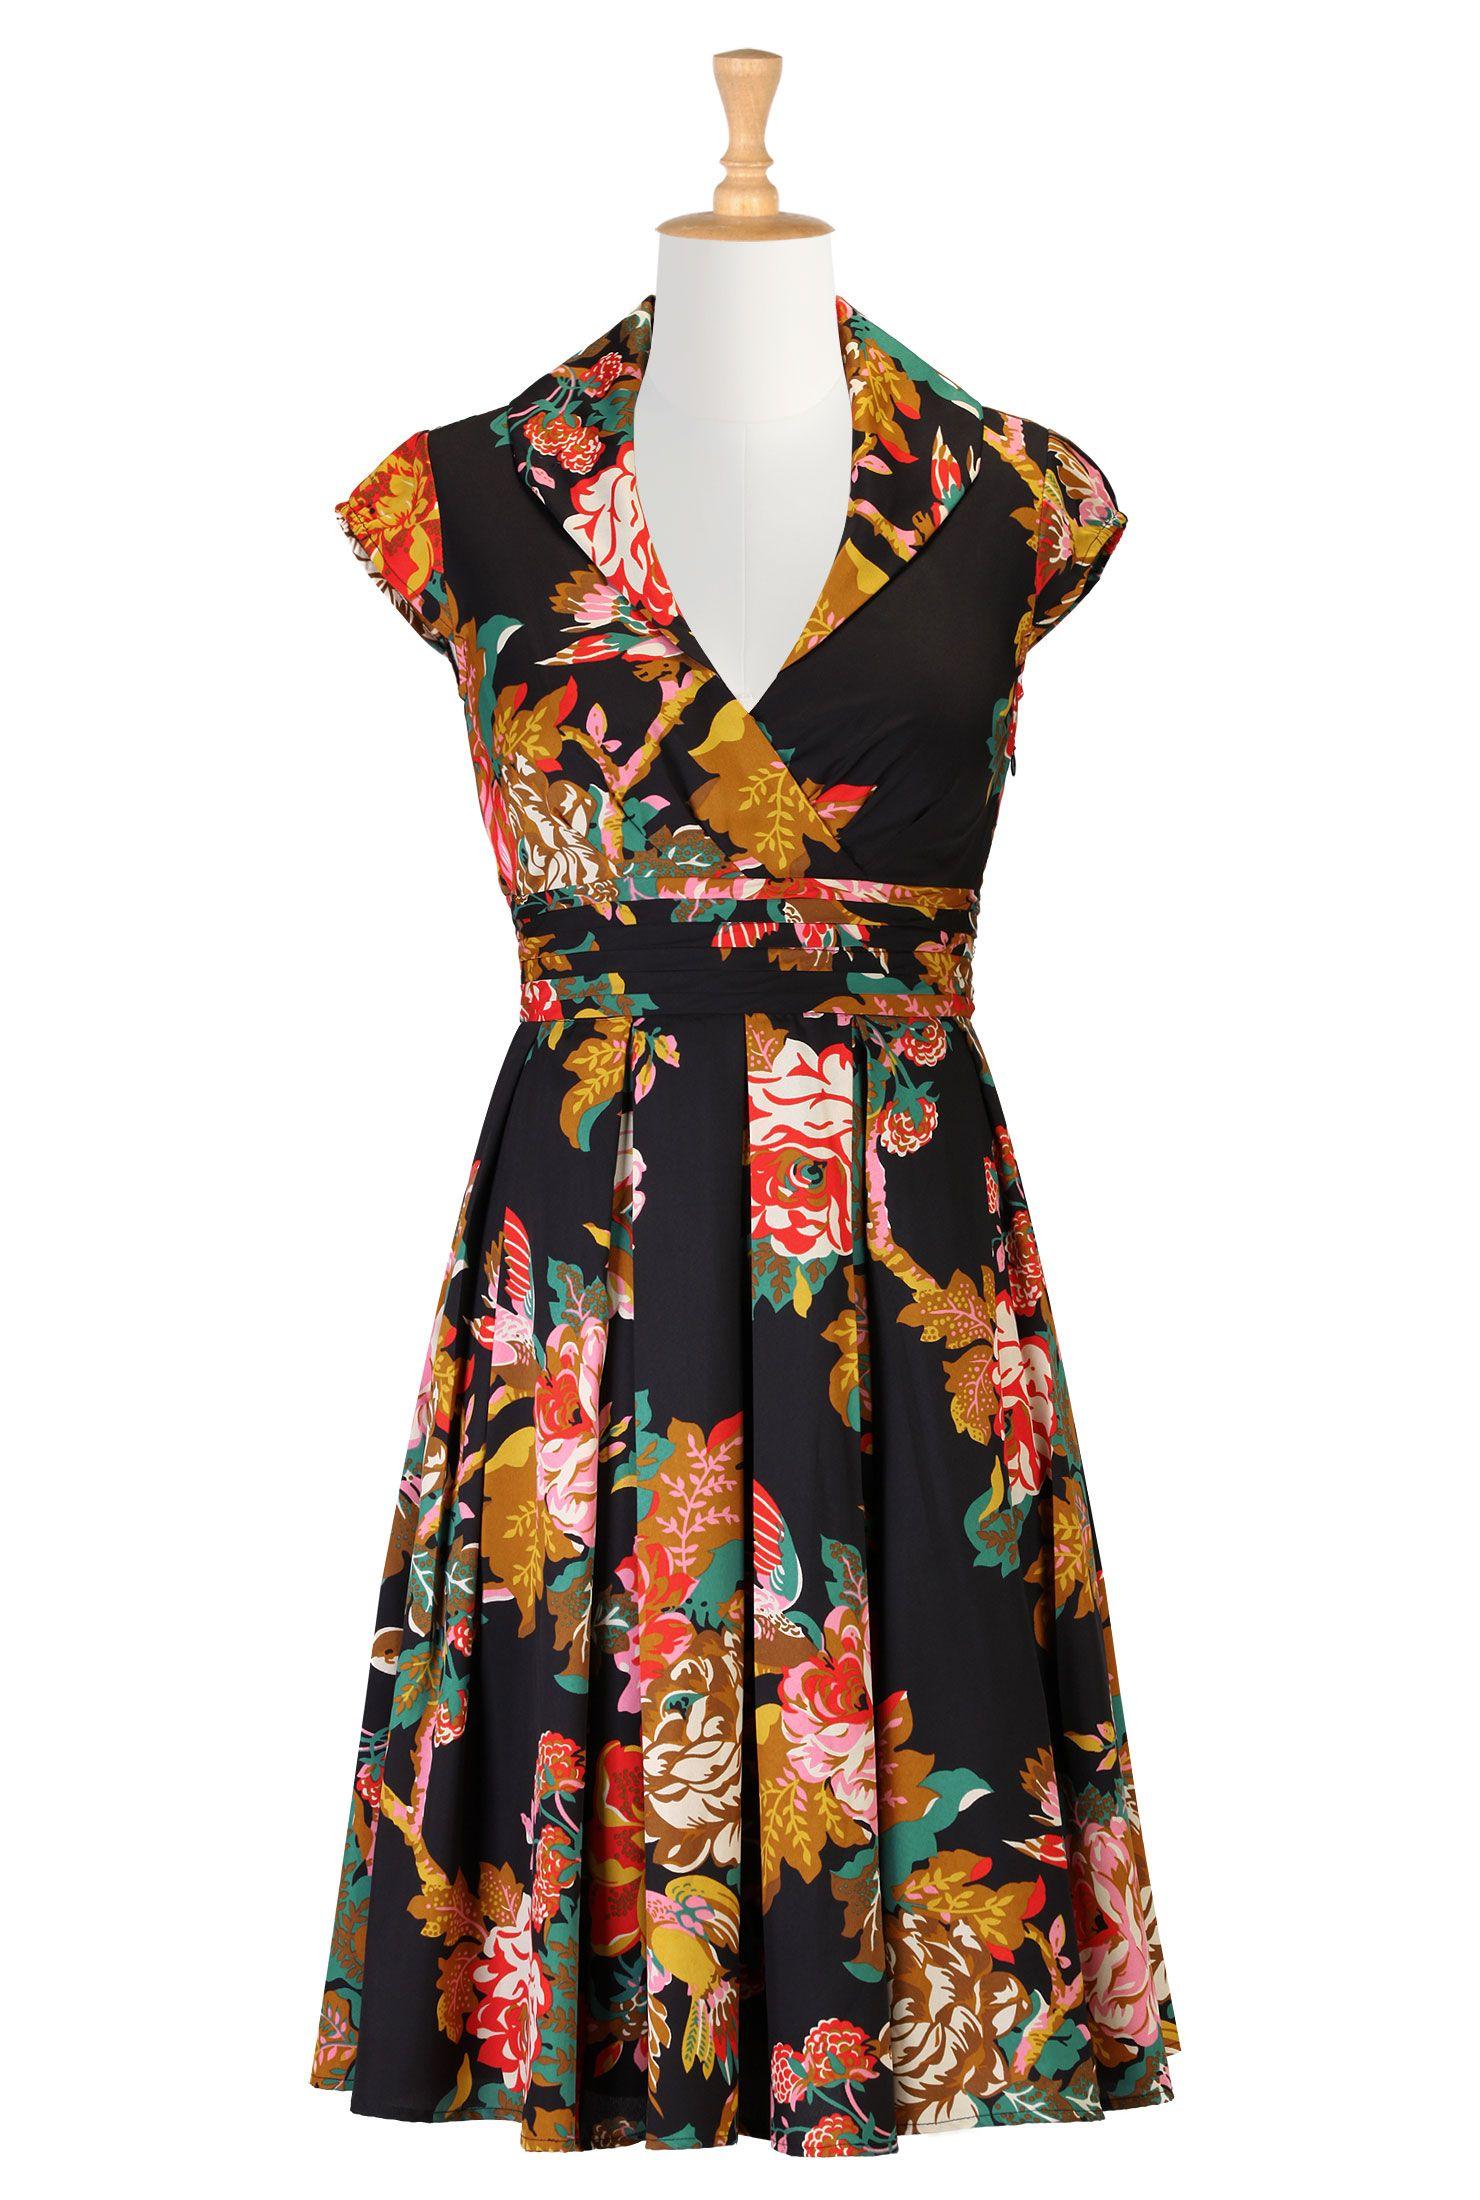 c33b3ec6d25de Womens stylish dress - Cocktail dresses, bridesmaid dresses, designer  dresses, womens short sleeve dresses | eShakti.com